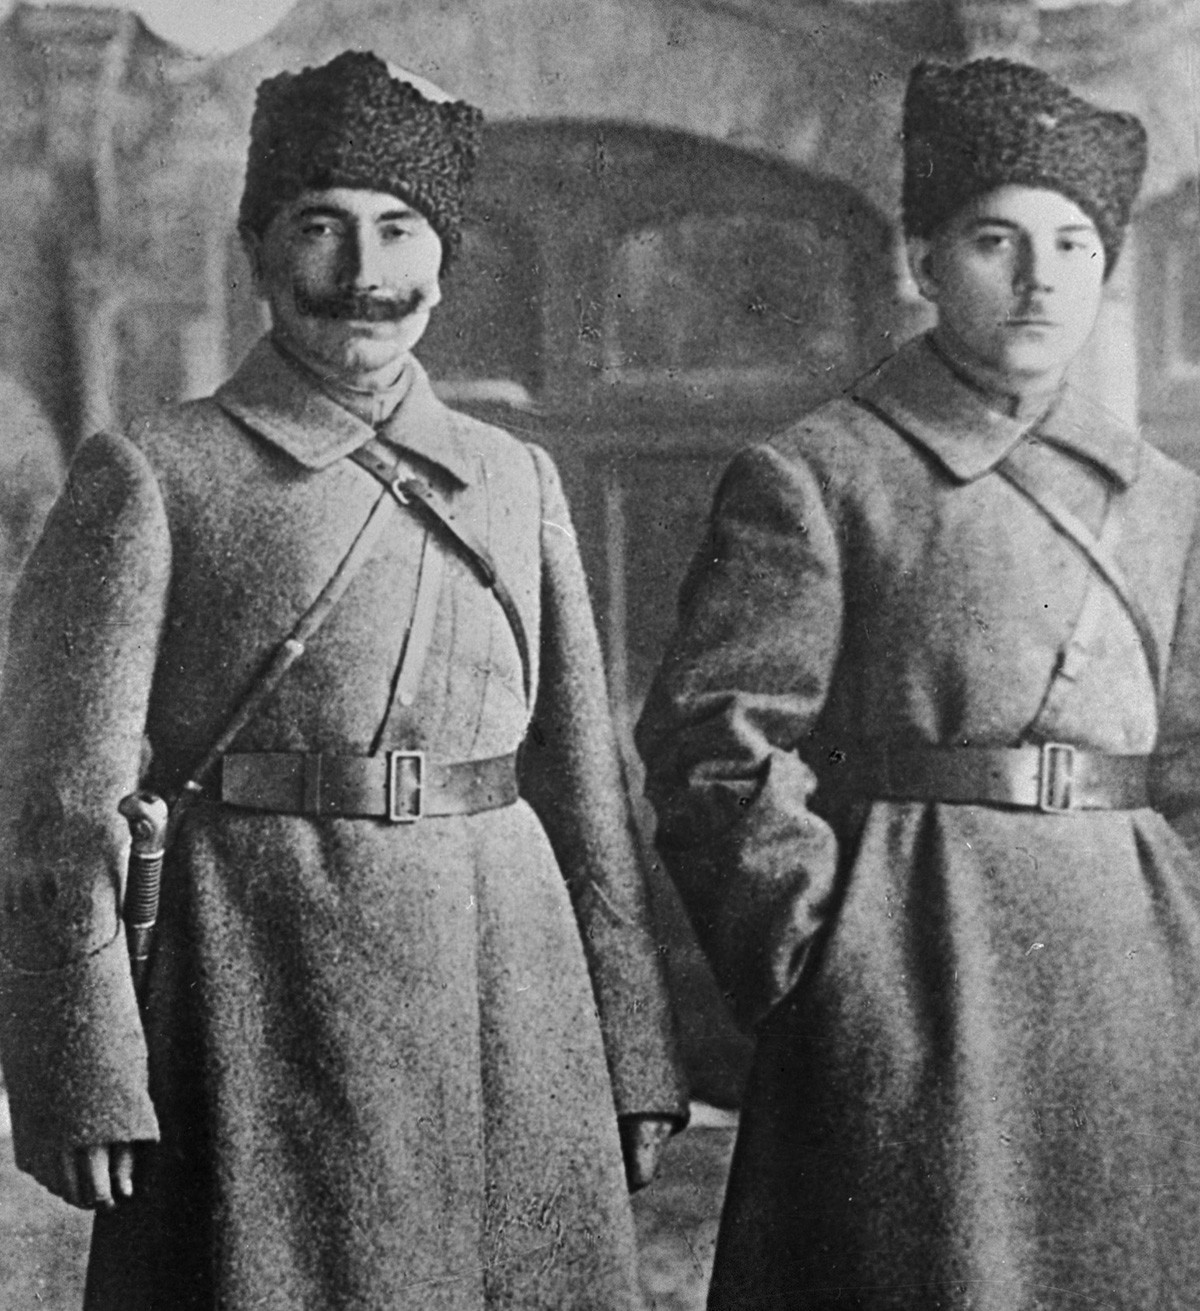 Semyon Budyonny dan Kliment Voroshilov pada 1918.